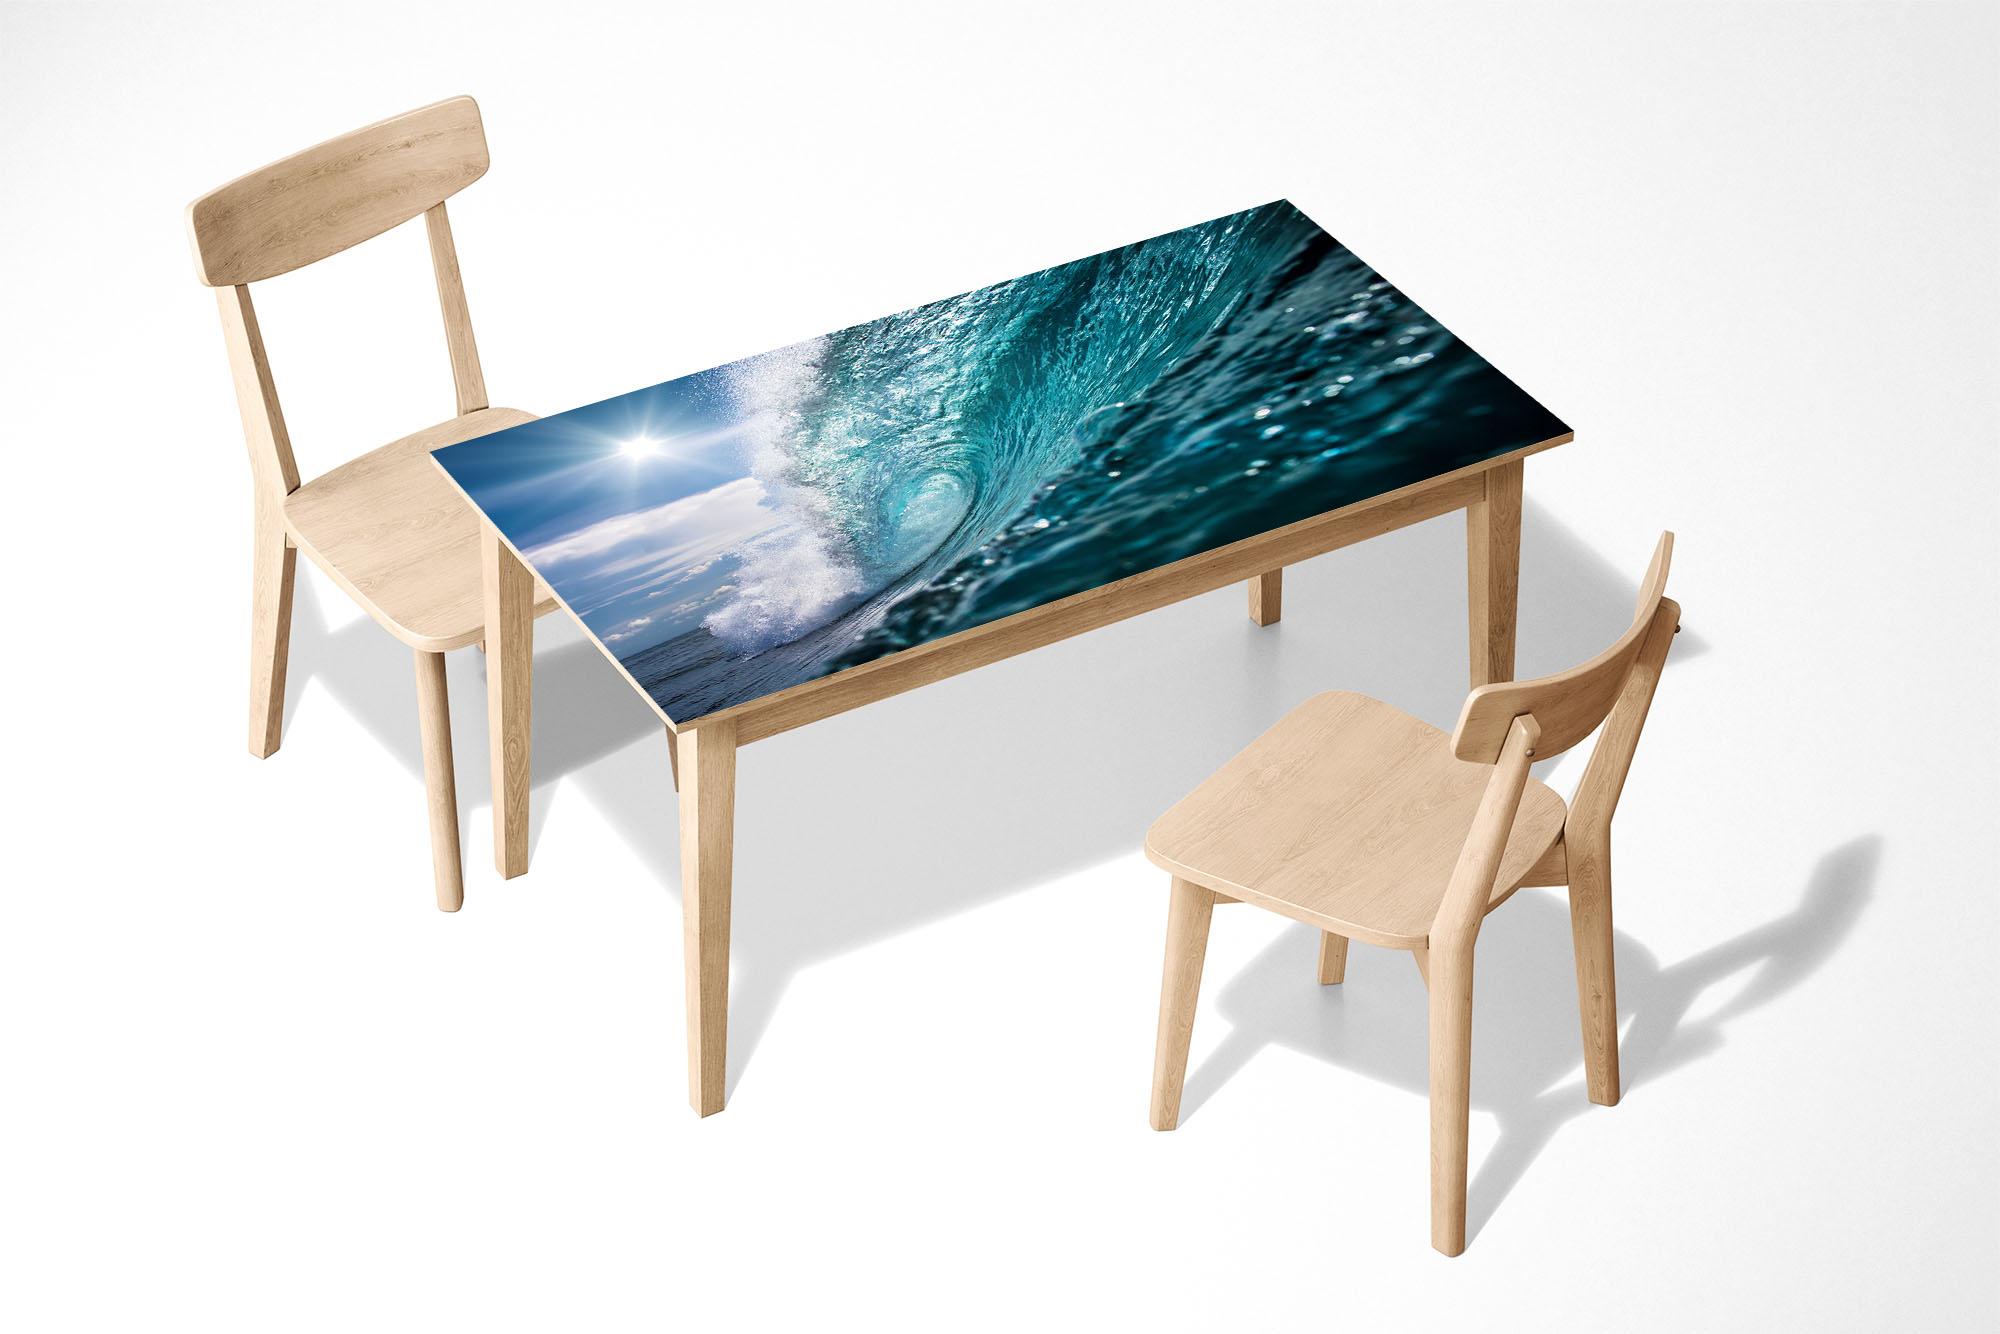 Blue Ocean Wave Laminated Self Adhesive Vinyl Table Desk Art Décor Cover